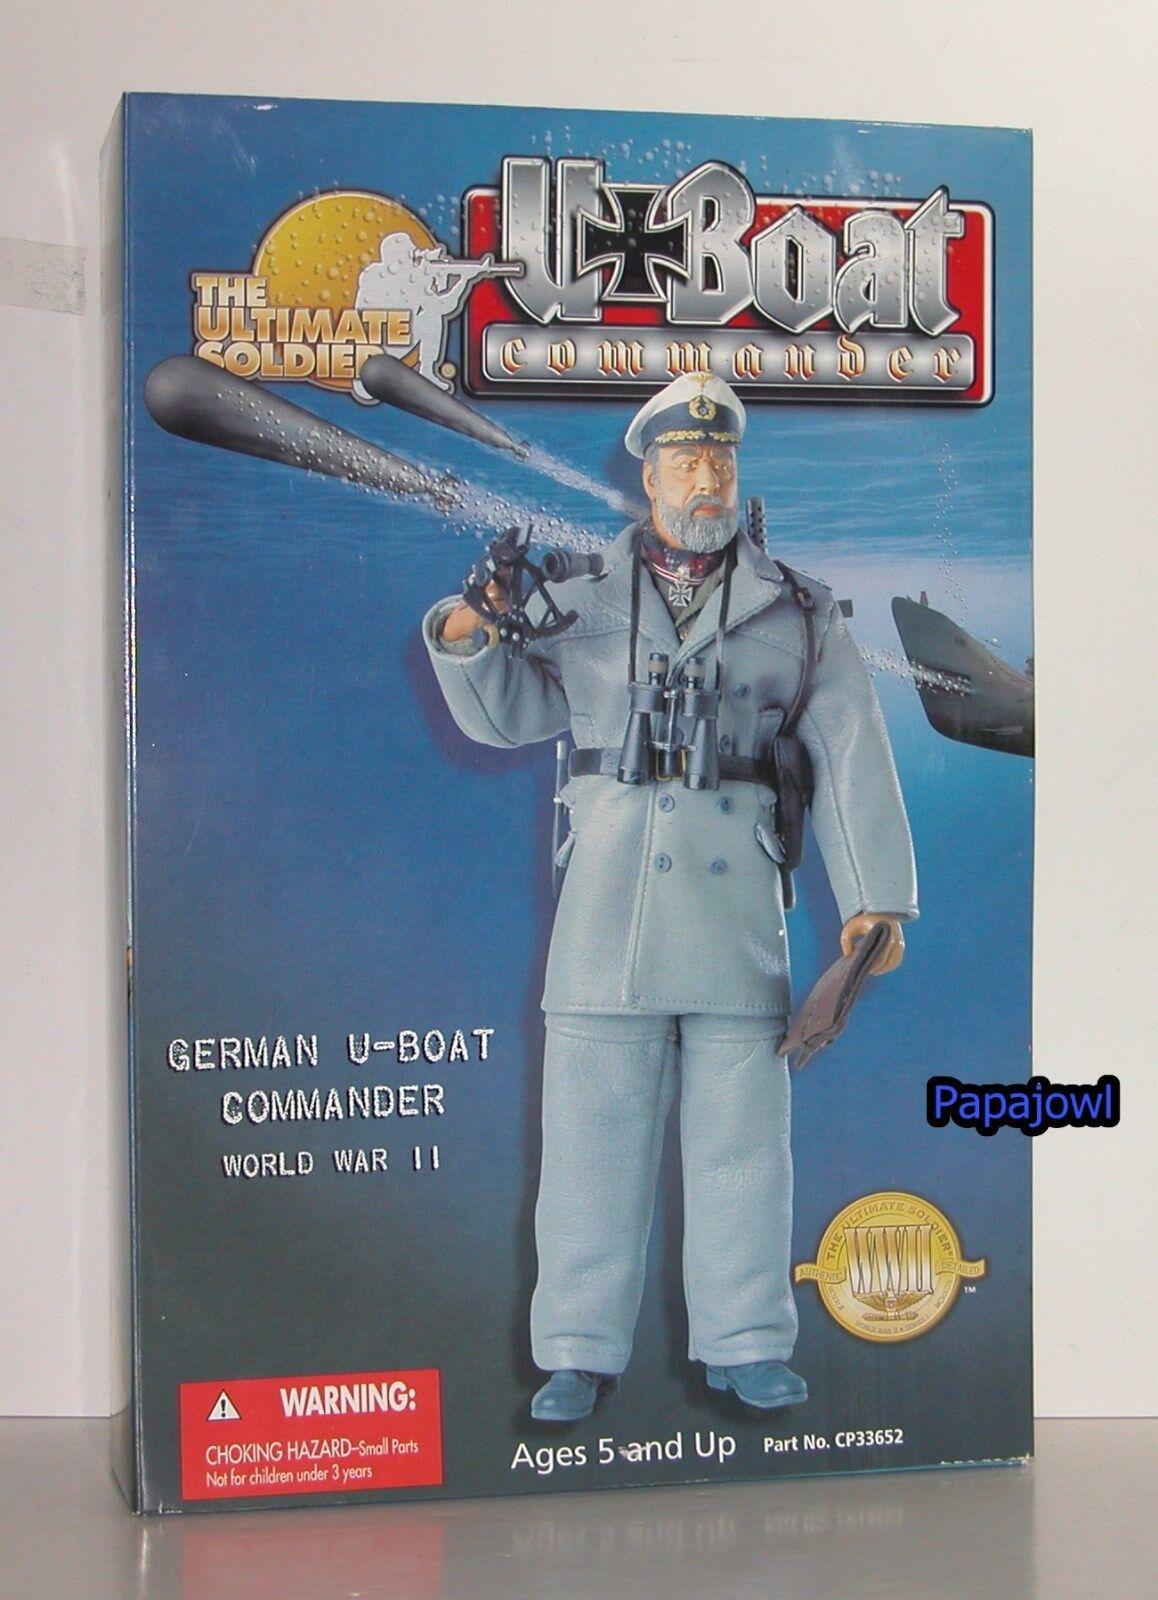 The Ultimate Soldier 21st Century German U-Boat Commander World War II 1944 12